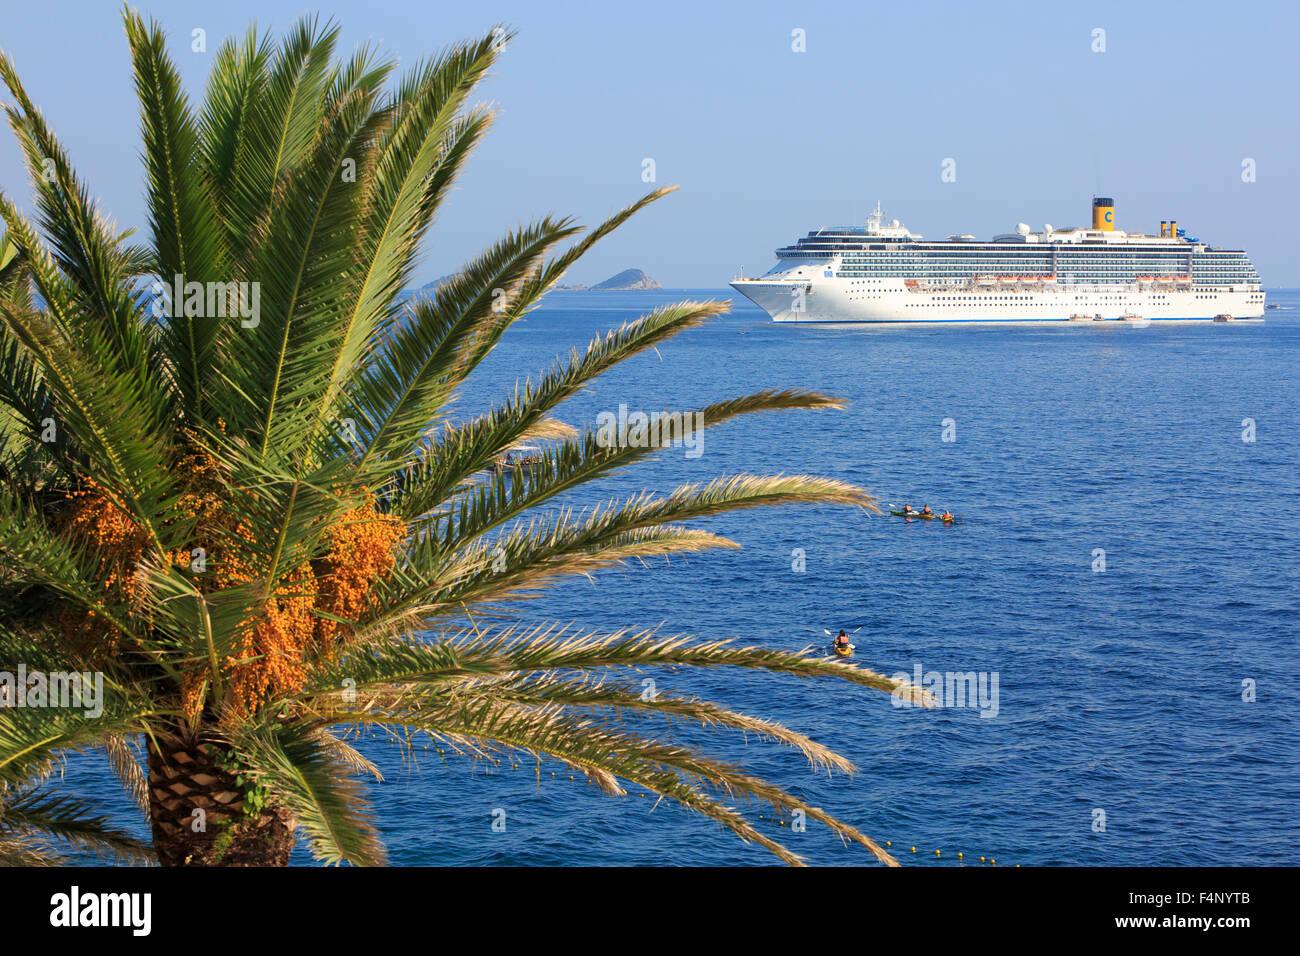 The Costa Mediterranea for anchor in Dubrovnik, Croatia - Stock Image